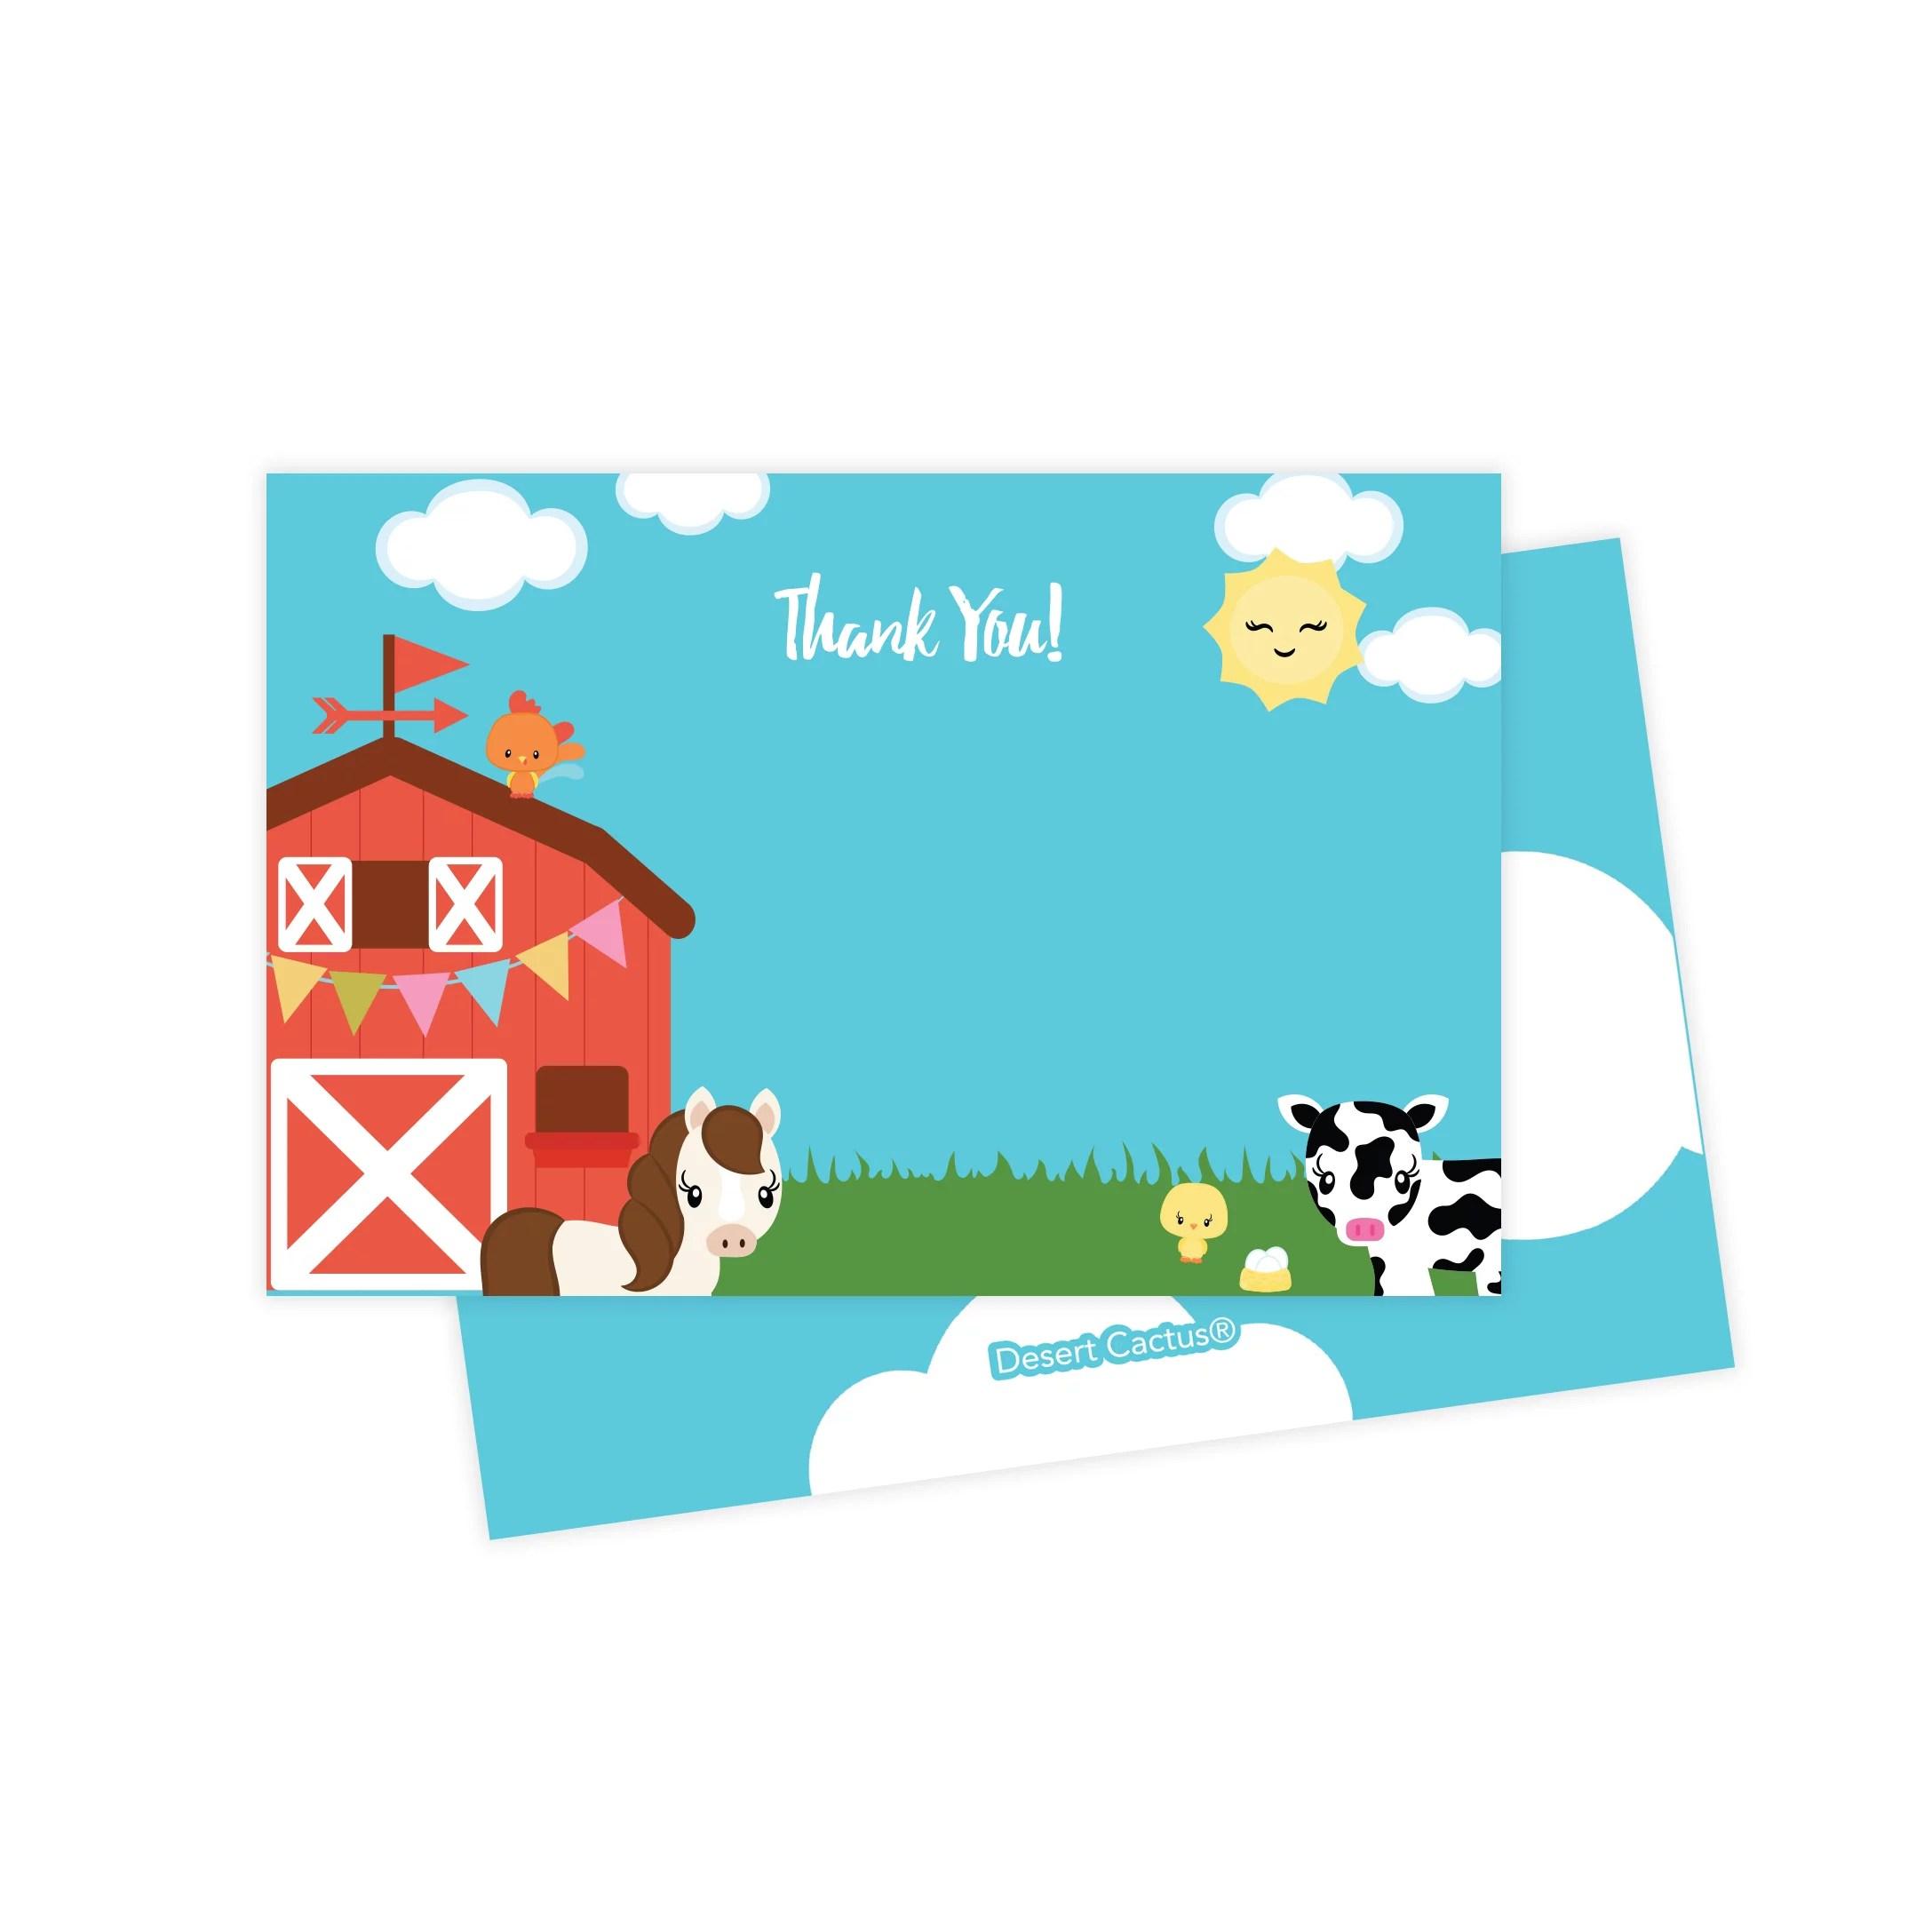 farm barnyard thank you cards 25 count with envelopes seal stickers bulk birthday party bridal blank graduation kids children boy girl